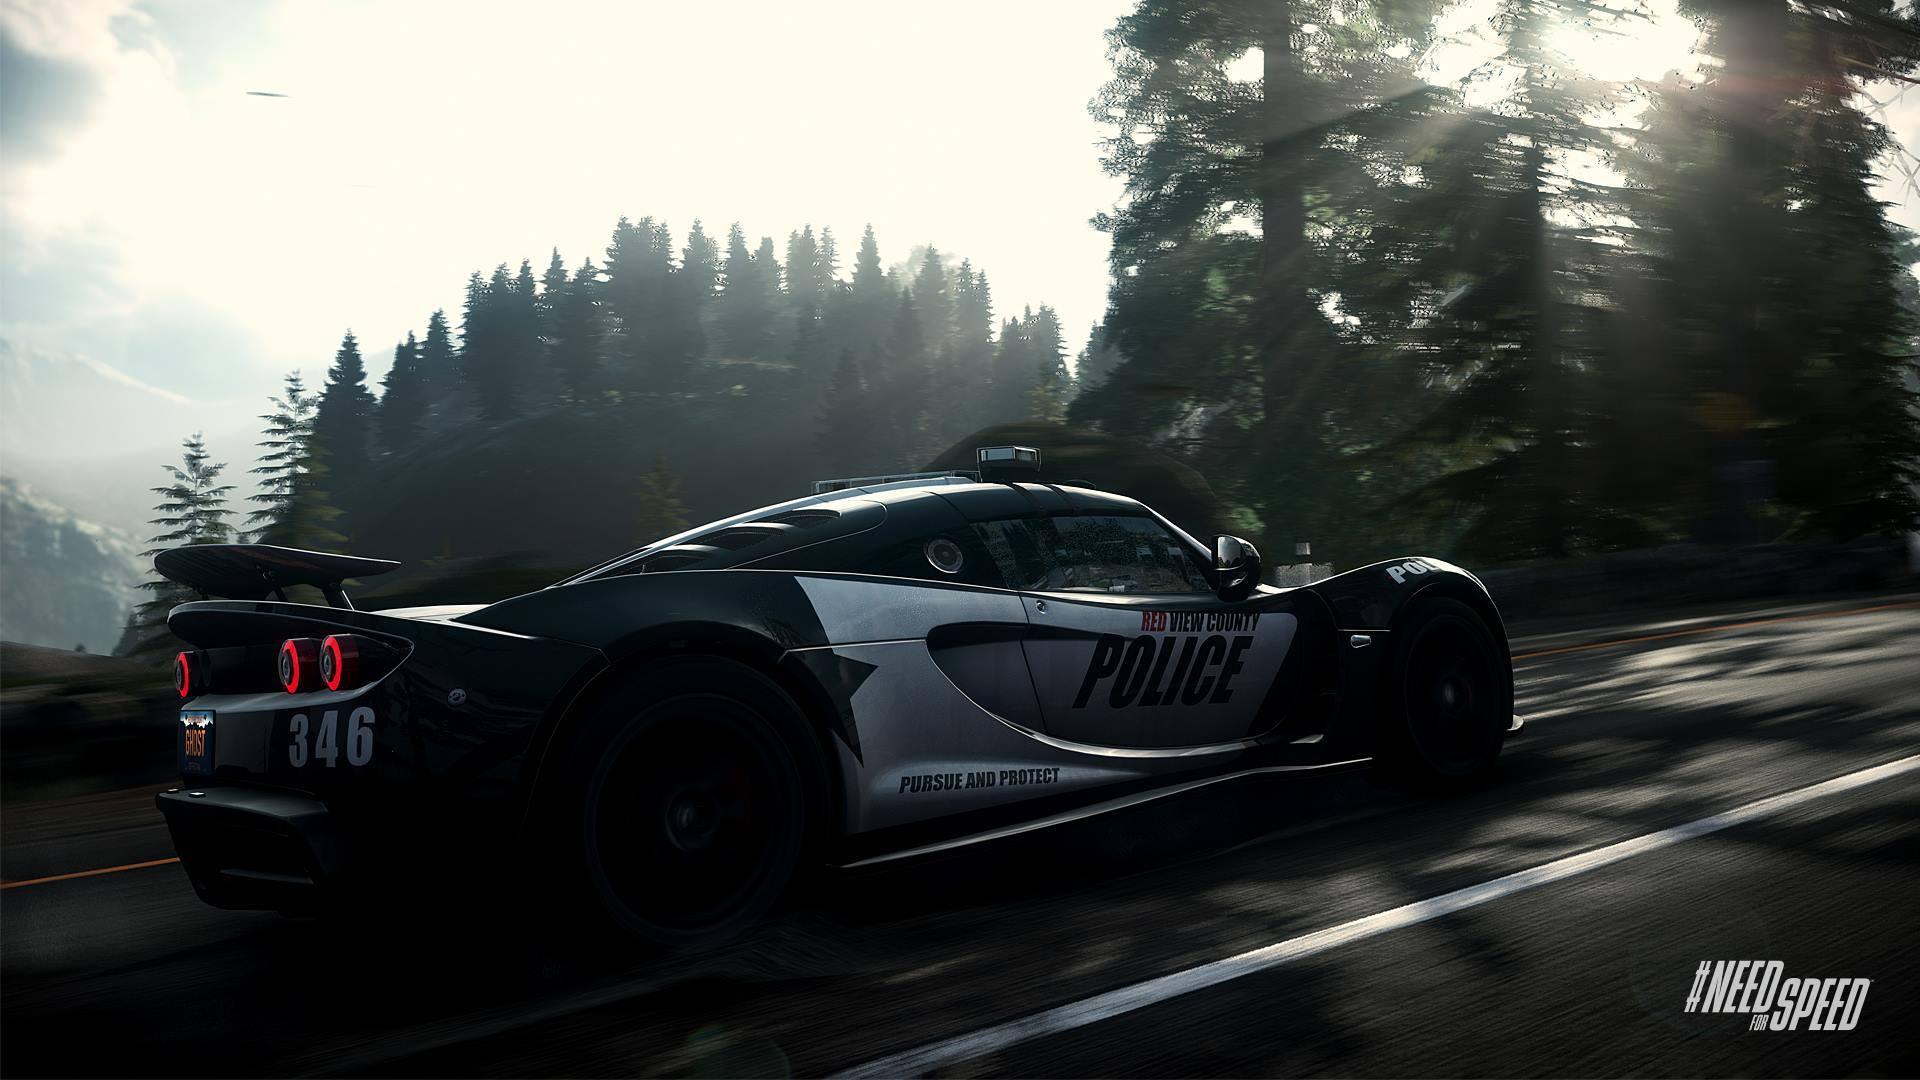 Hennessey Venom GT (2012) | Need for Speed Wiki | FANDOM ...